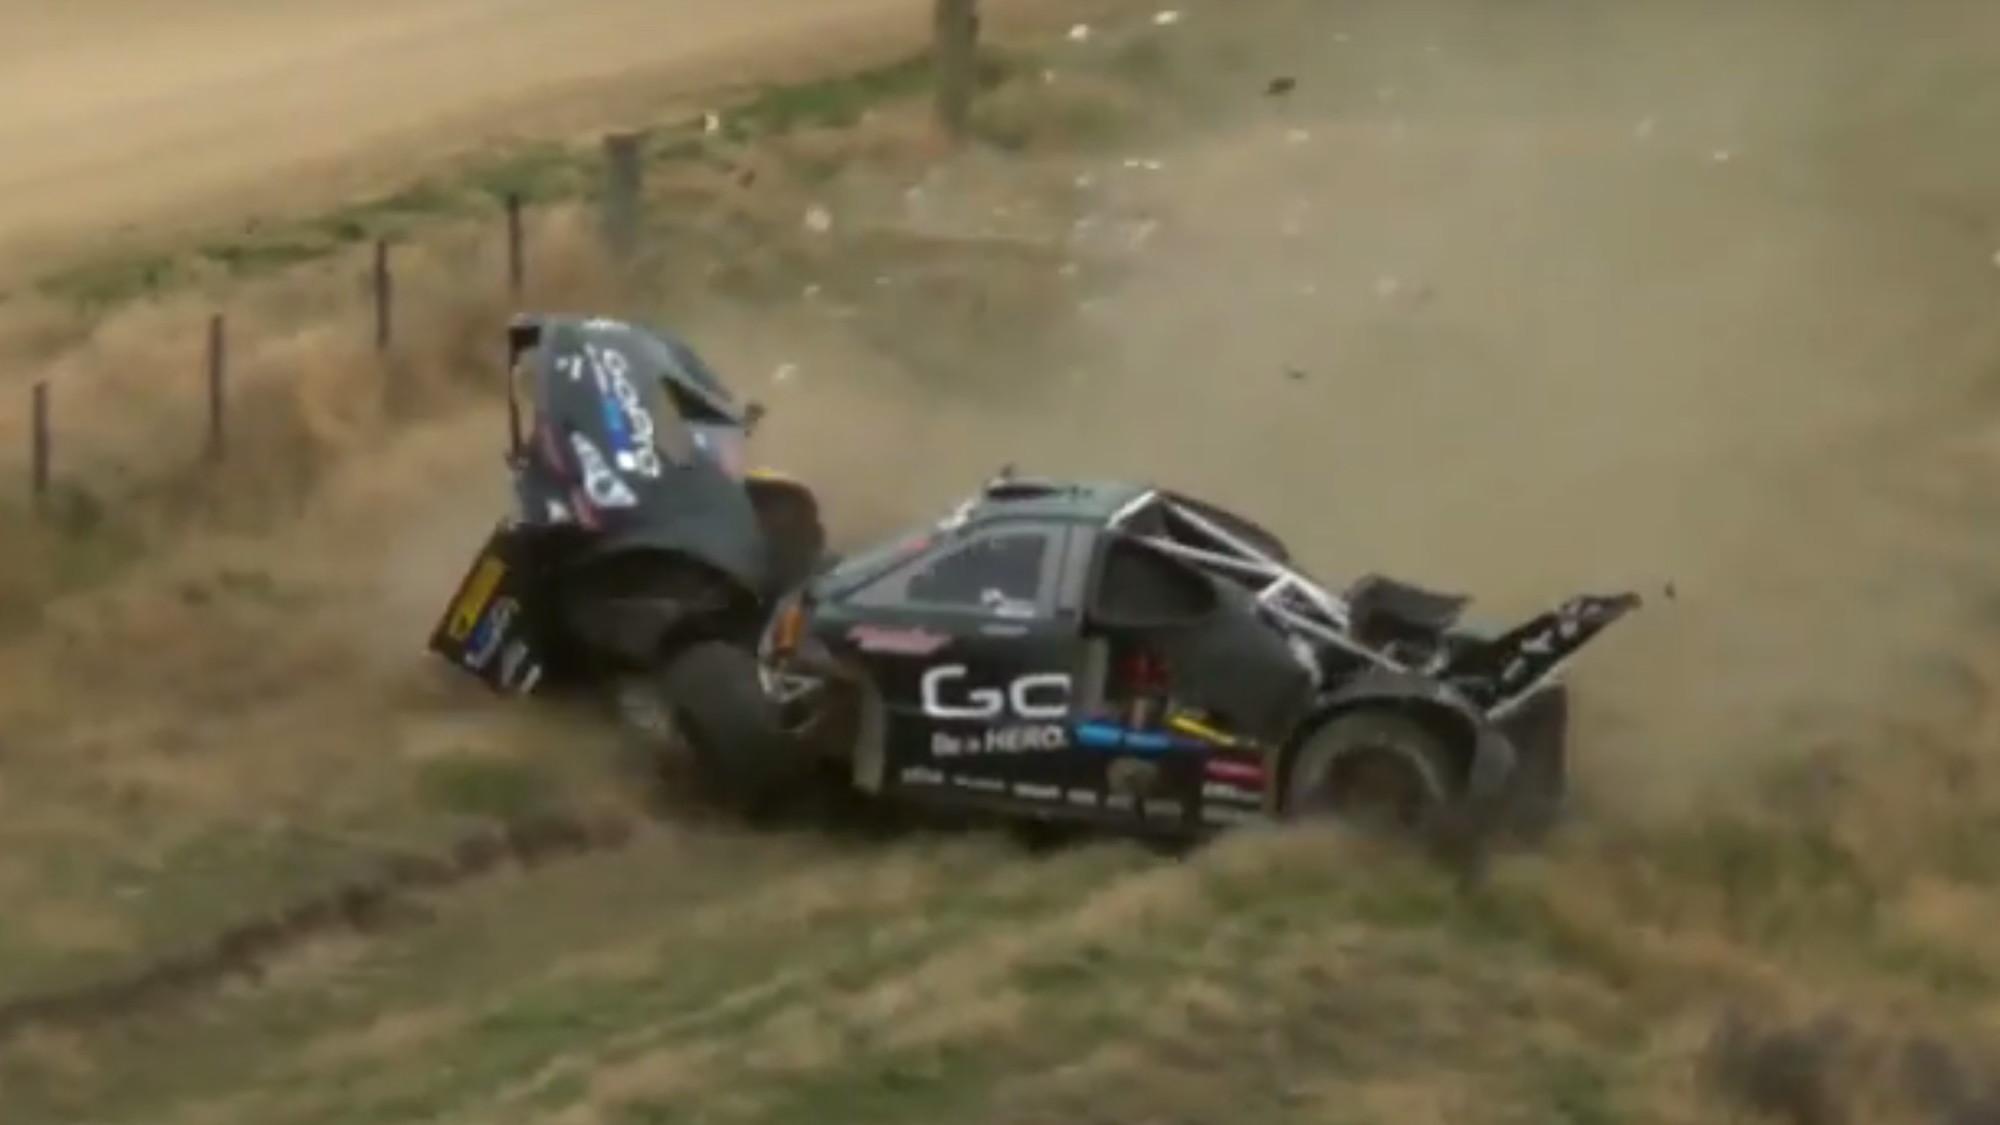 Monster Tajima's car comes apart at speed, causing wreck